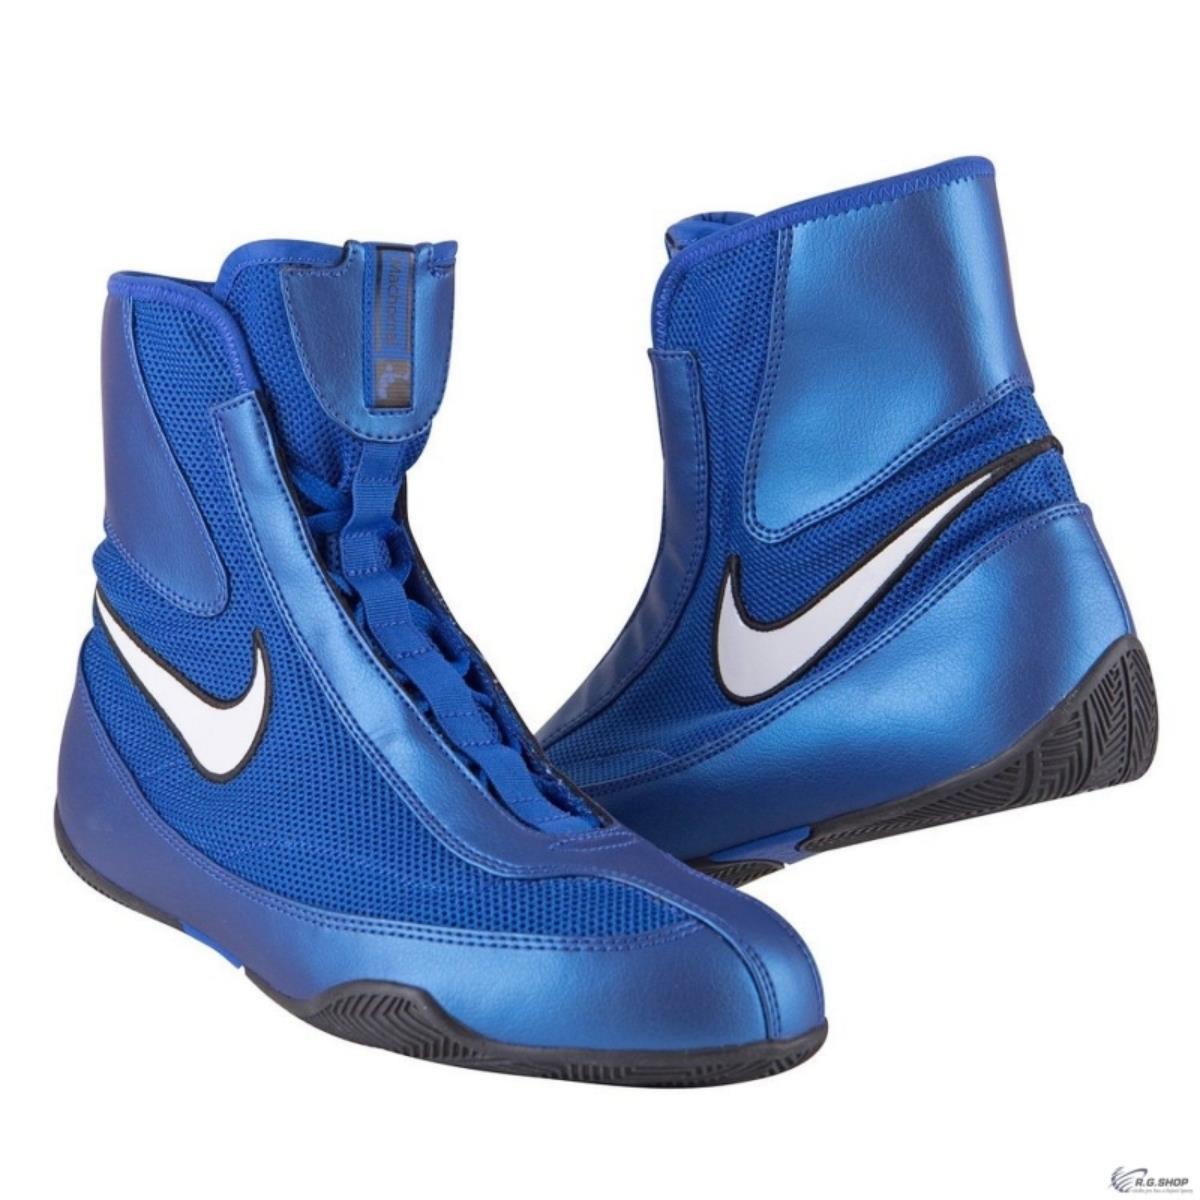 Da Mid Machomai Nike Boxe Scarpe Y1xqw4UU